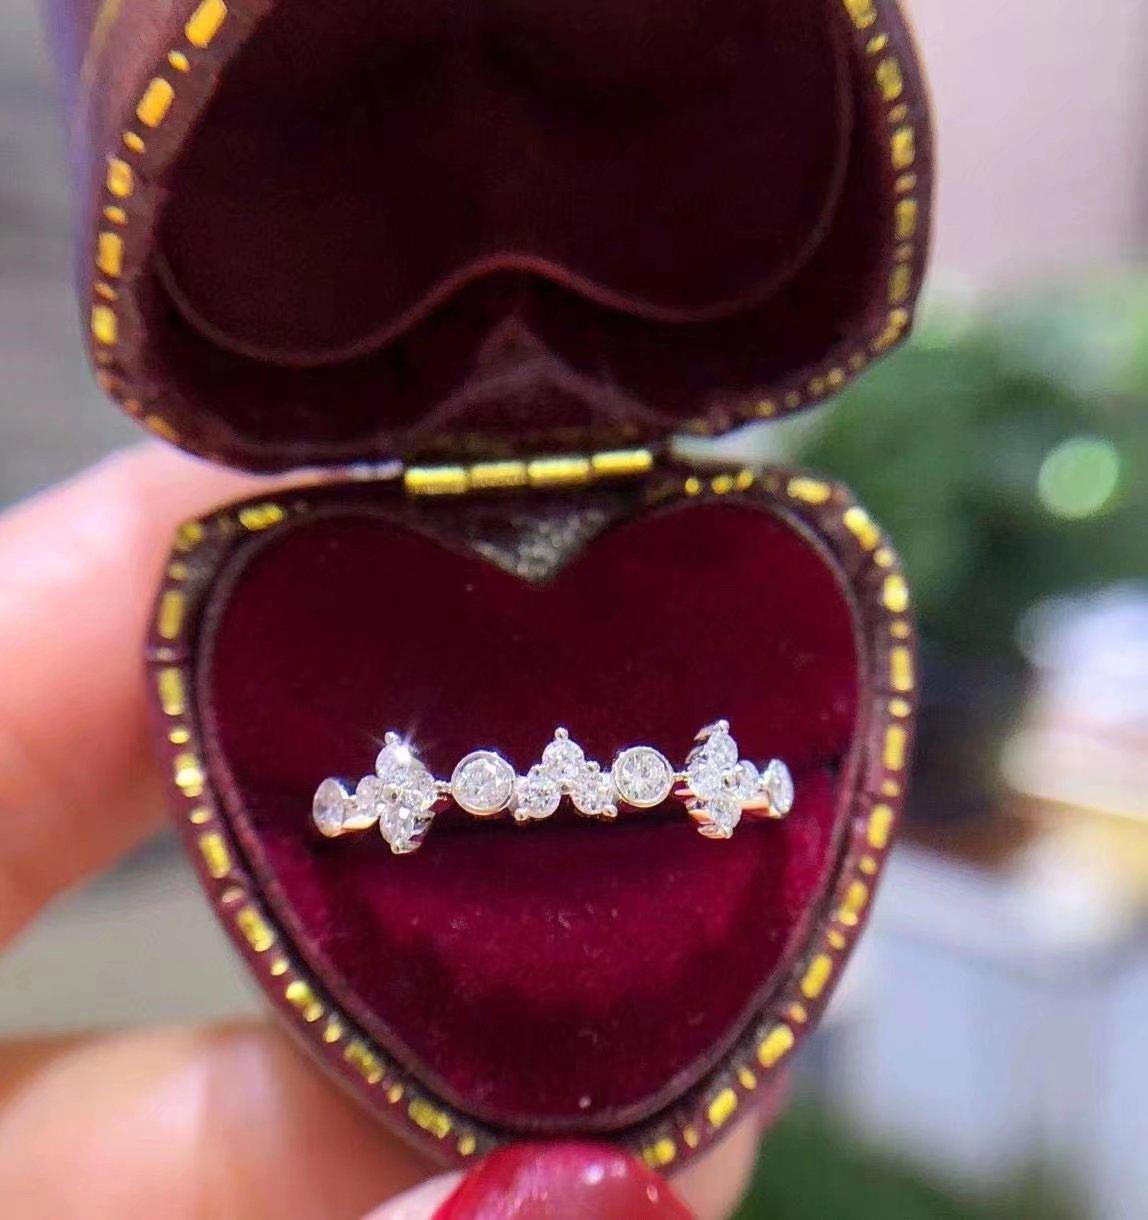 18K白金镶嵌女款 0.22克拉天然南非大钻小钻圆钻钻石戒指真金真钻